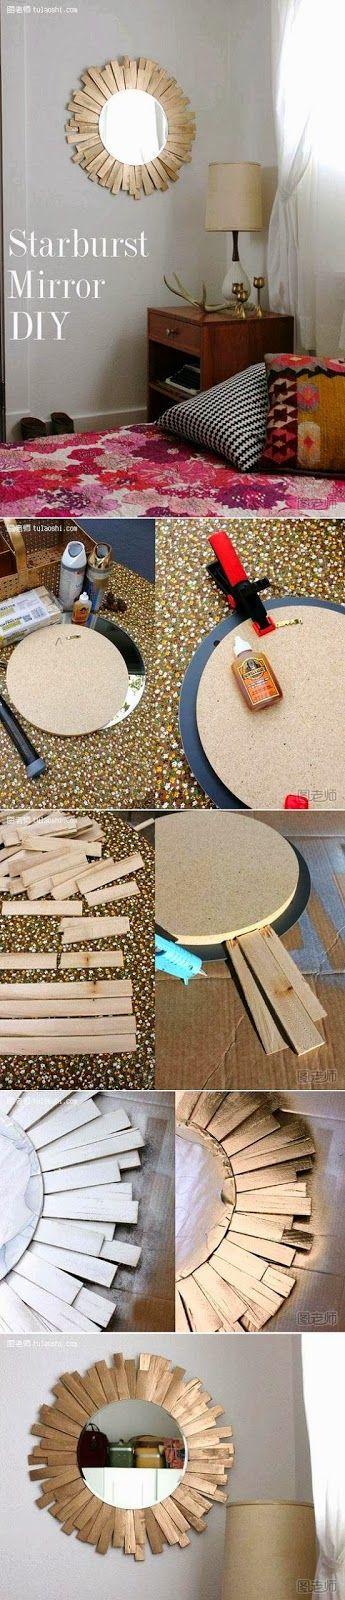 My DIY Projects: Diy Starburst Mirror